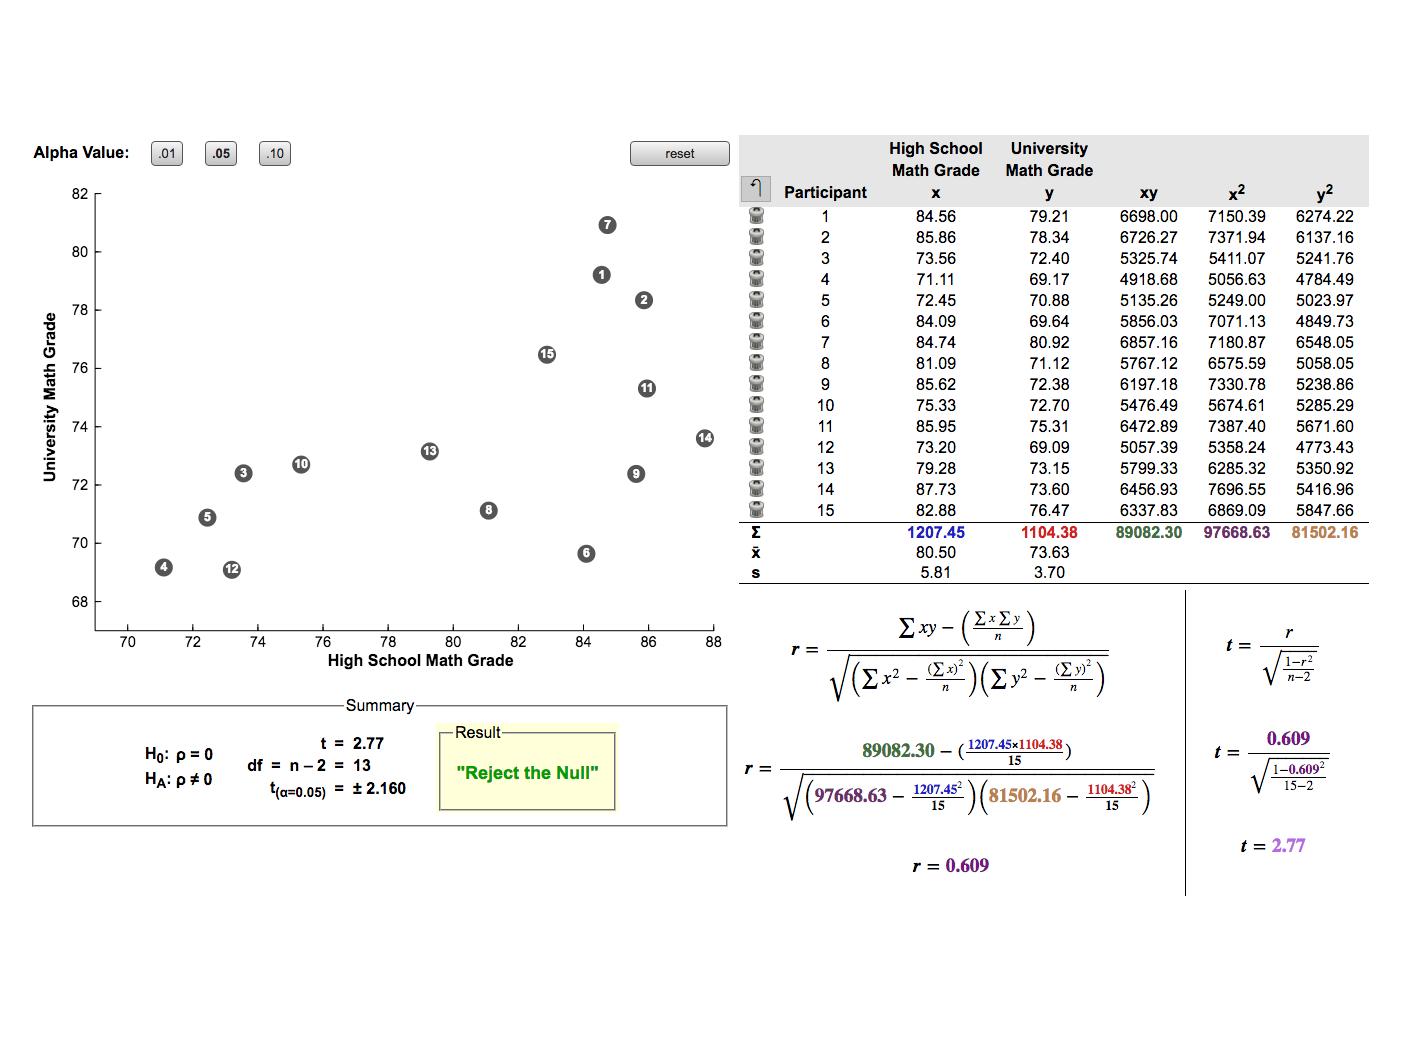 Figure 12.1 Pearson\'s Bivariate Correlation